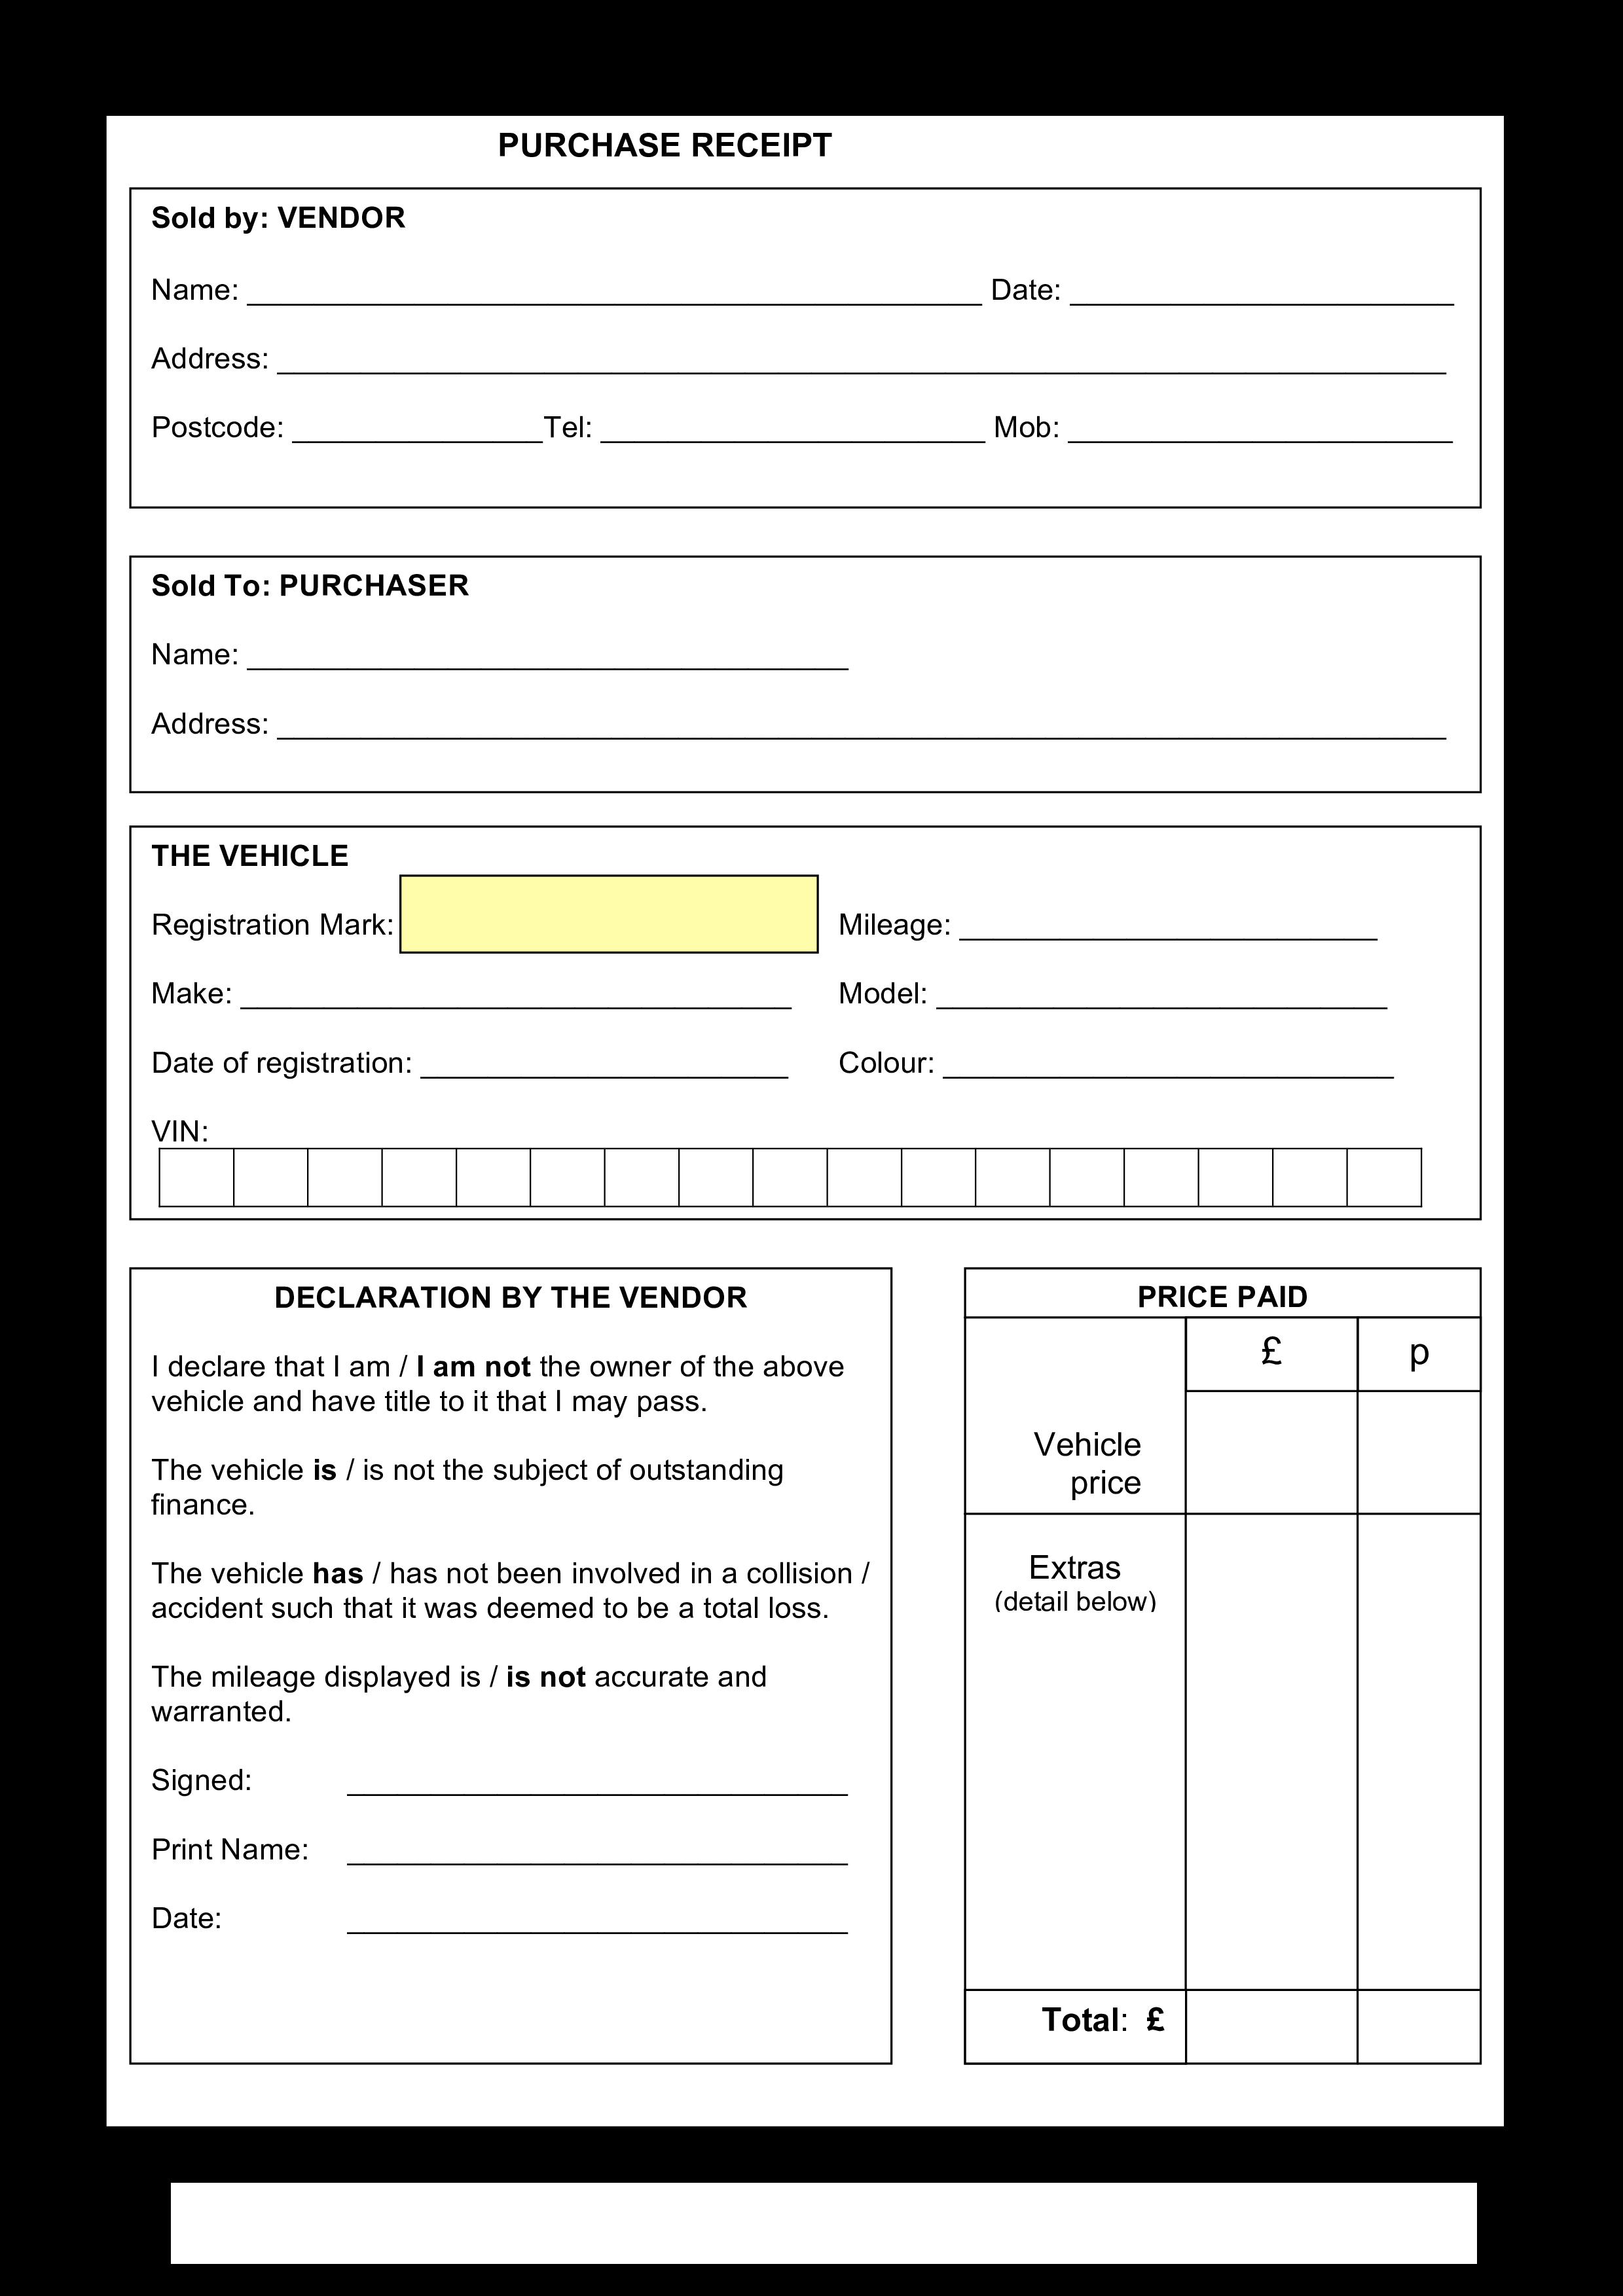 Free Purchase Receipt sample   Templates at allbusinesstemplates.com